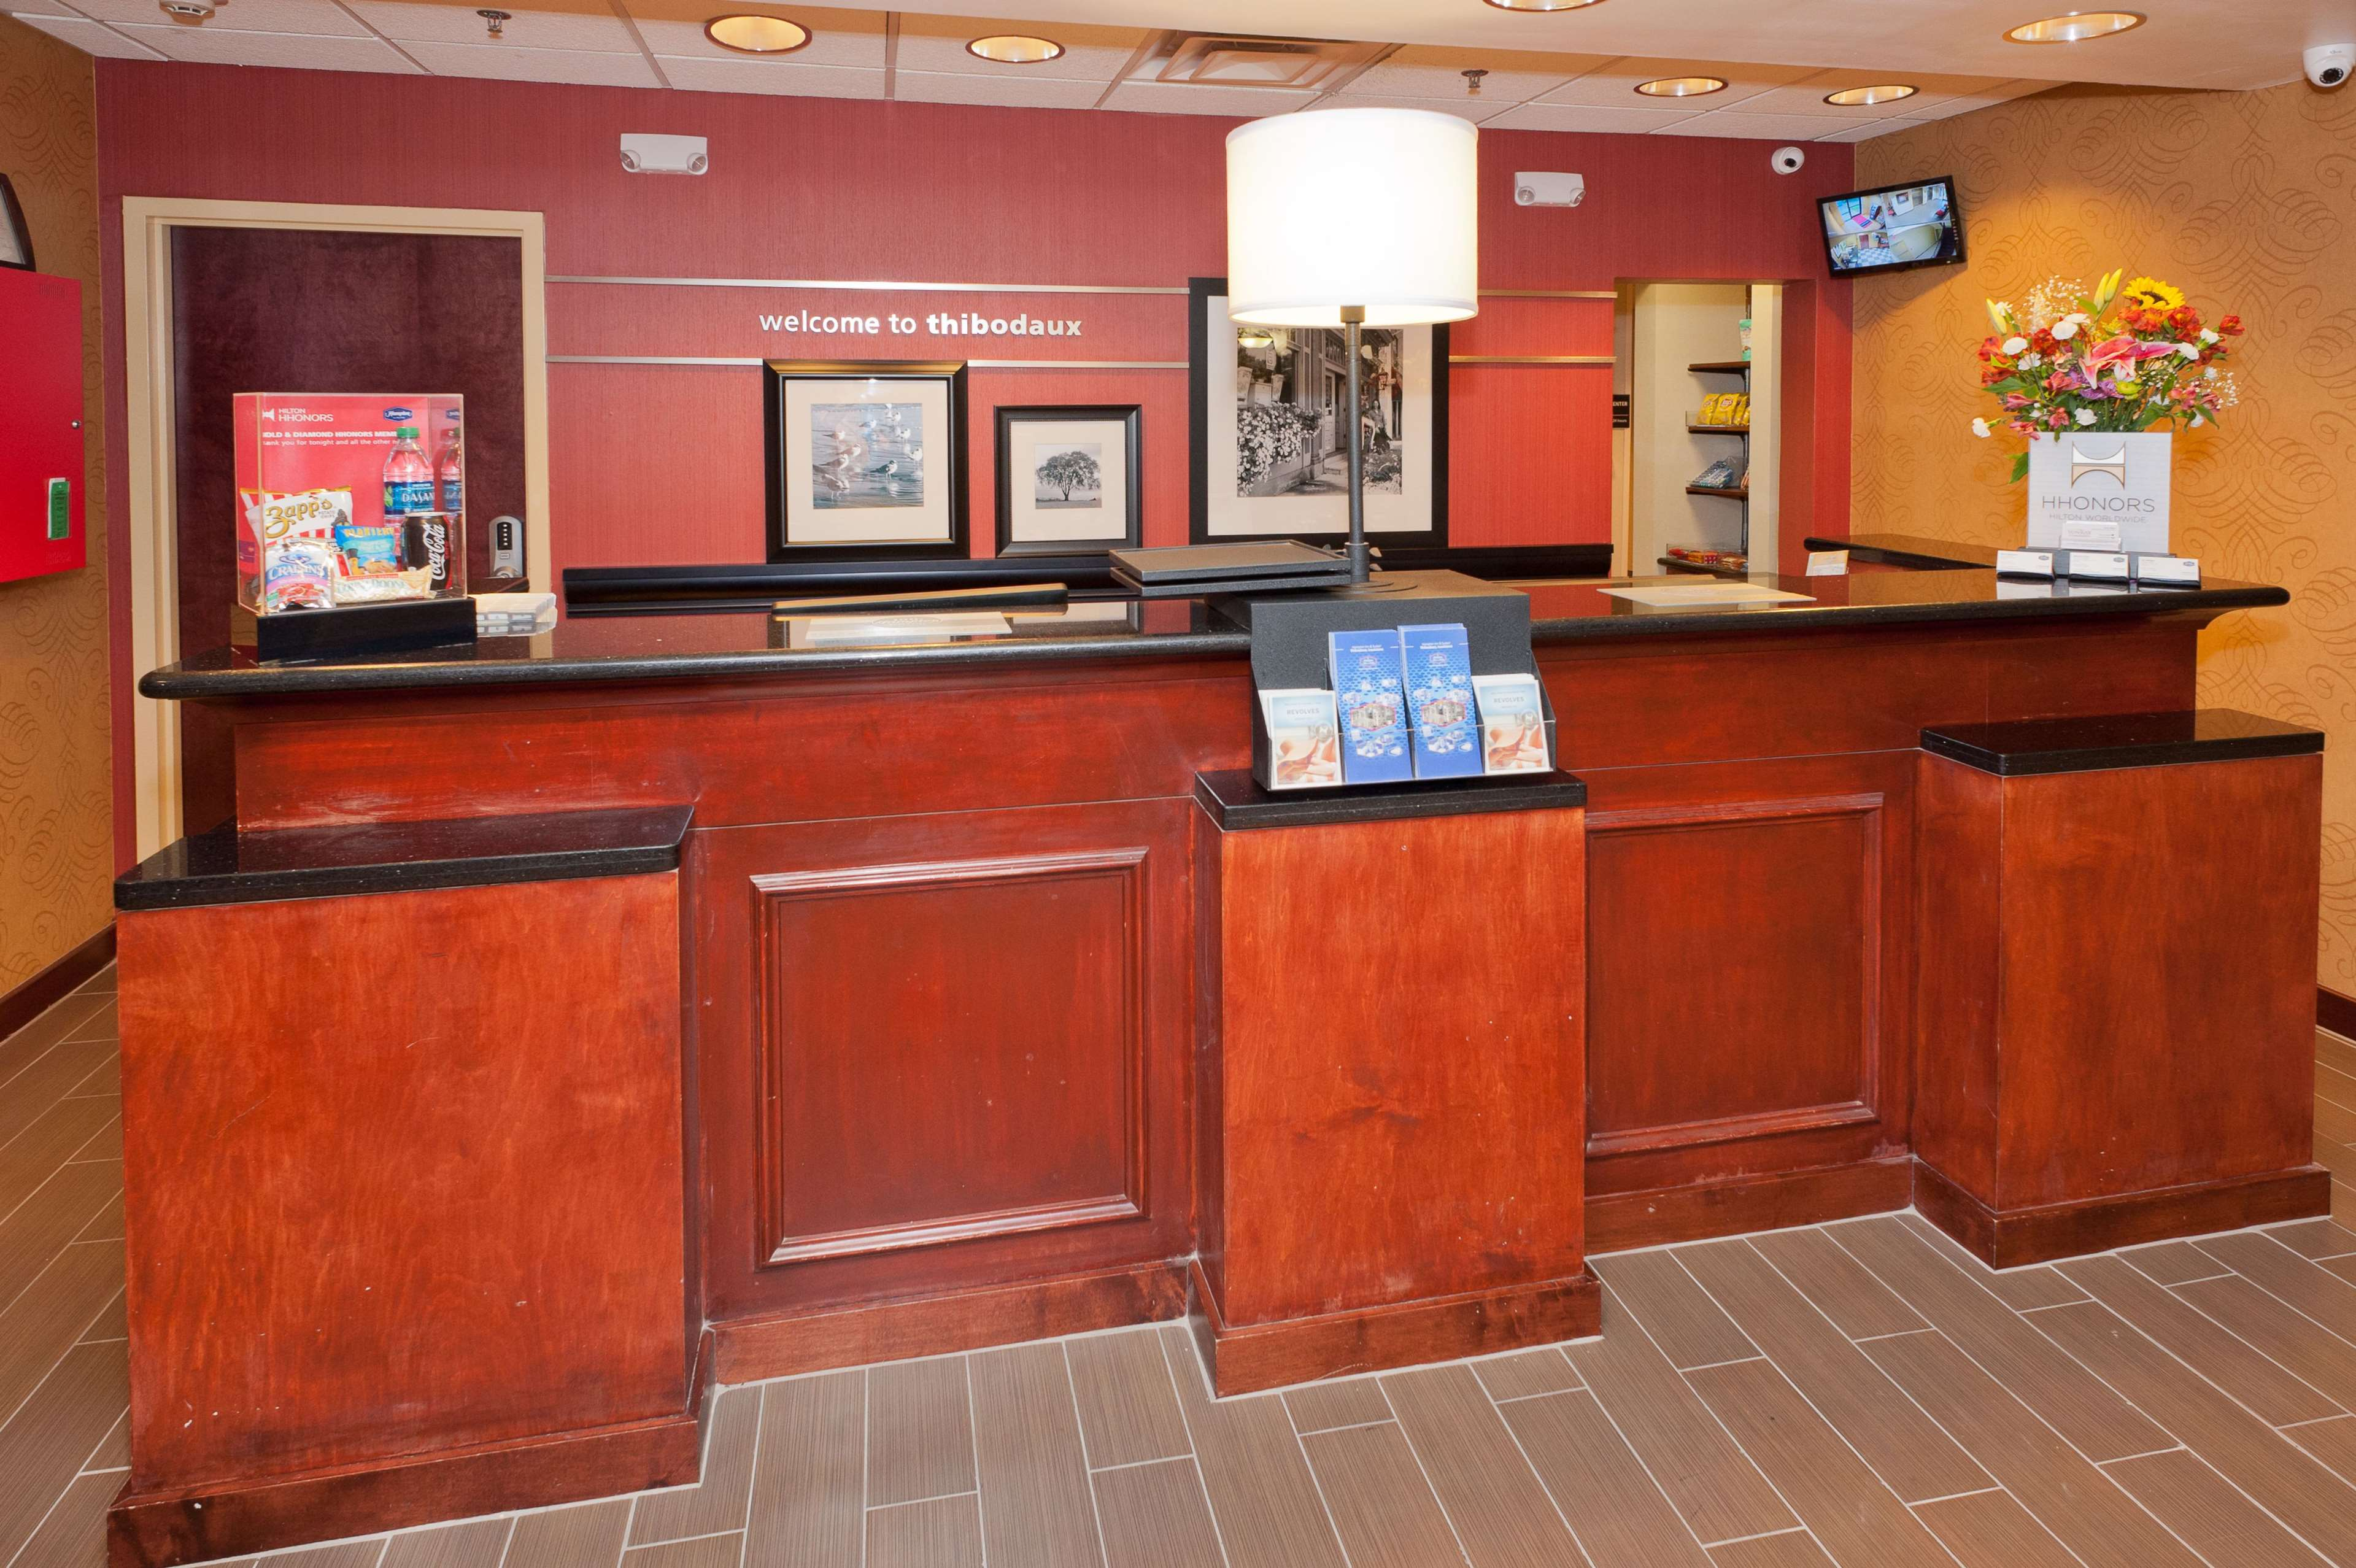 Hampton Inn & Suites Thibodaux image 2